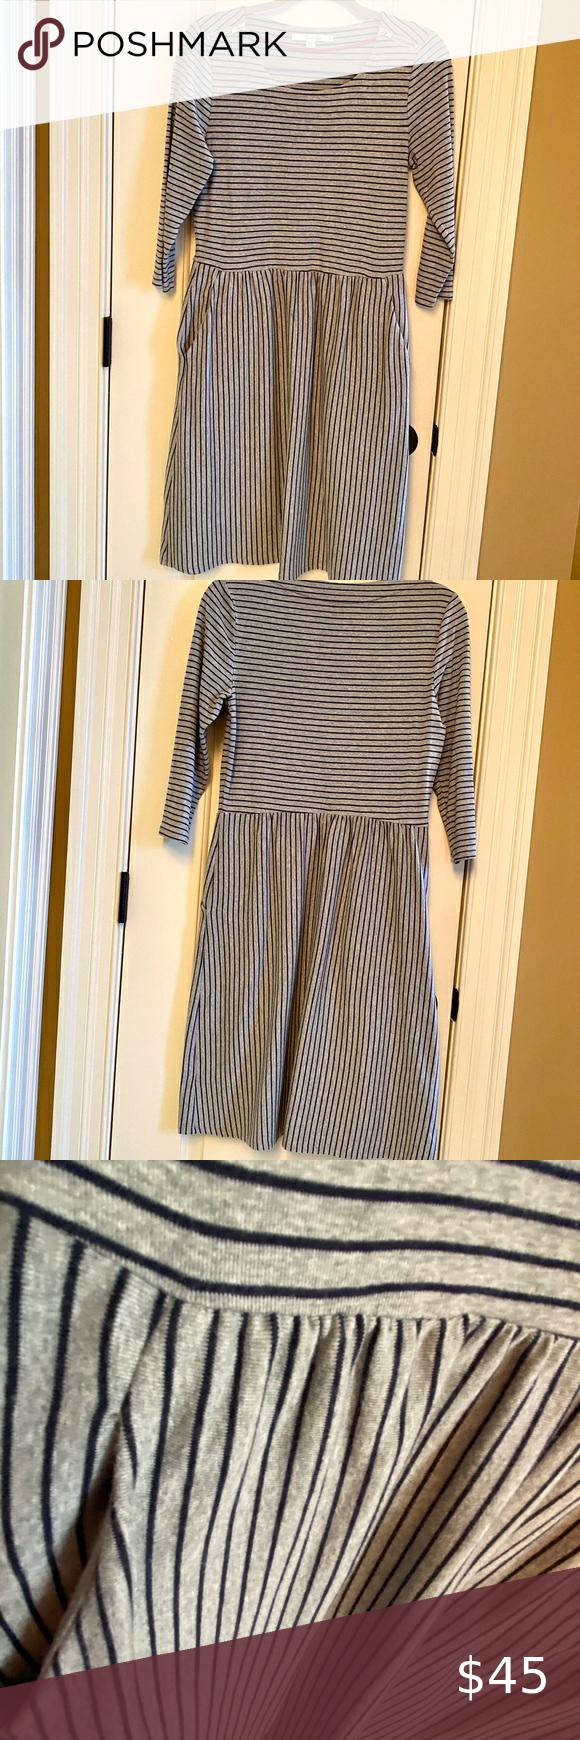 Boden Janie Dress - Gray/Black Stripe - Size 10L B